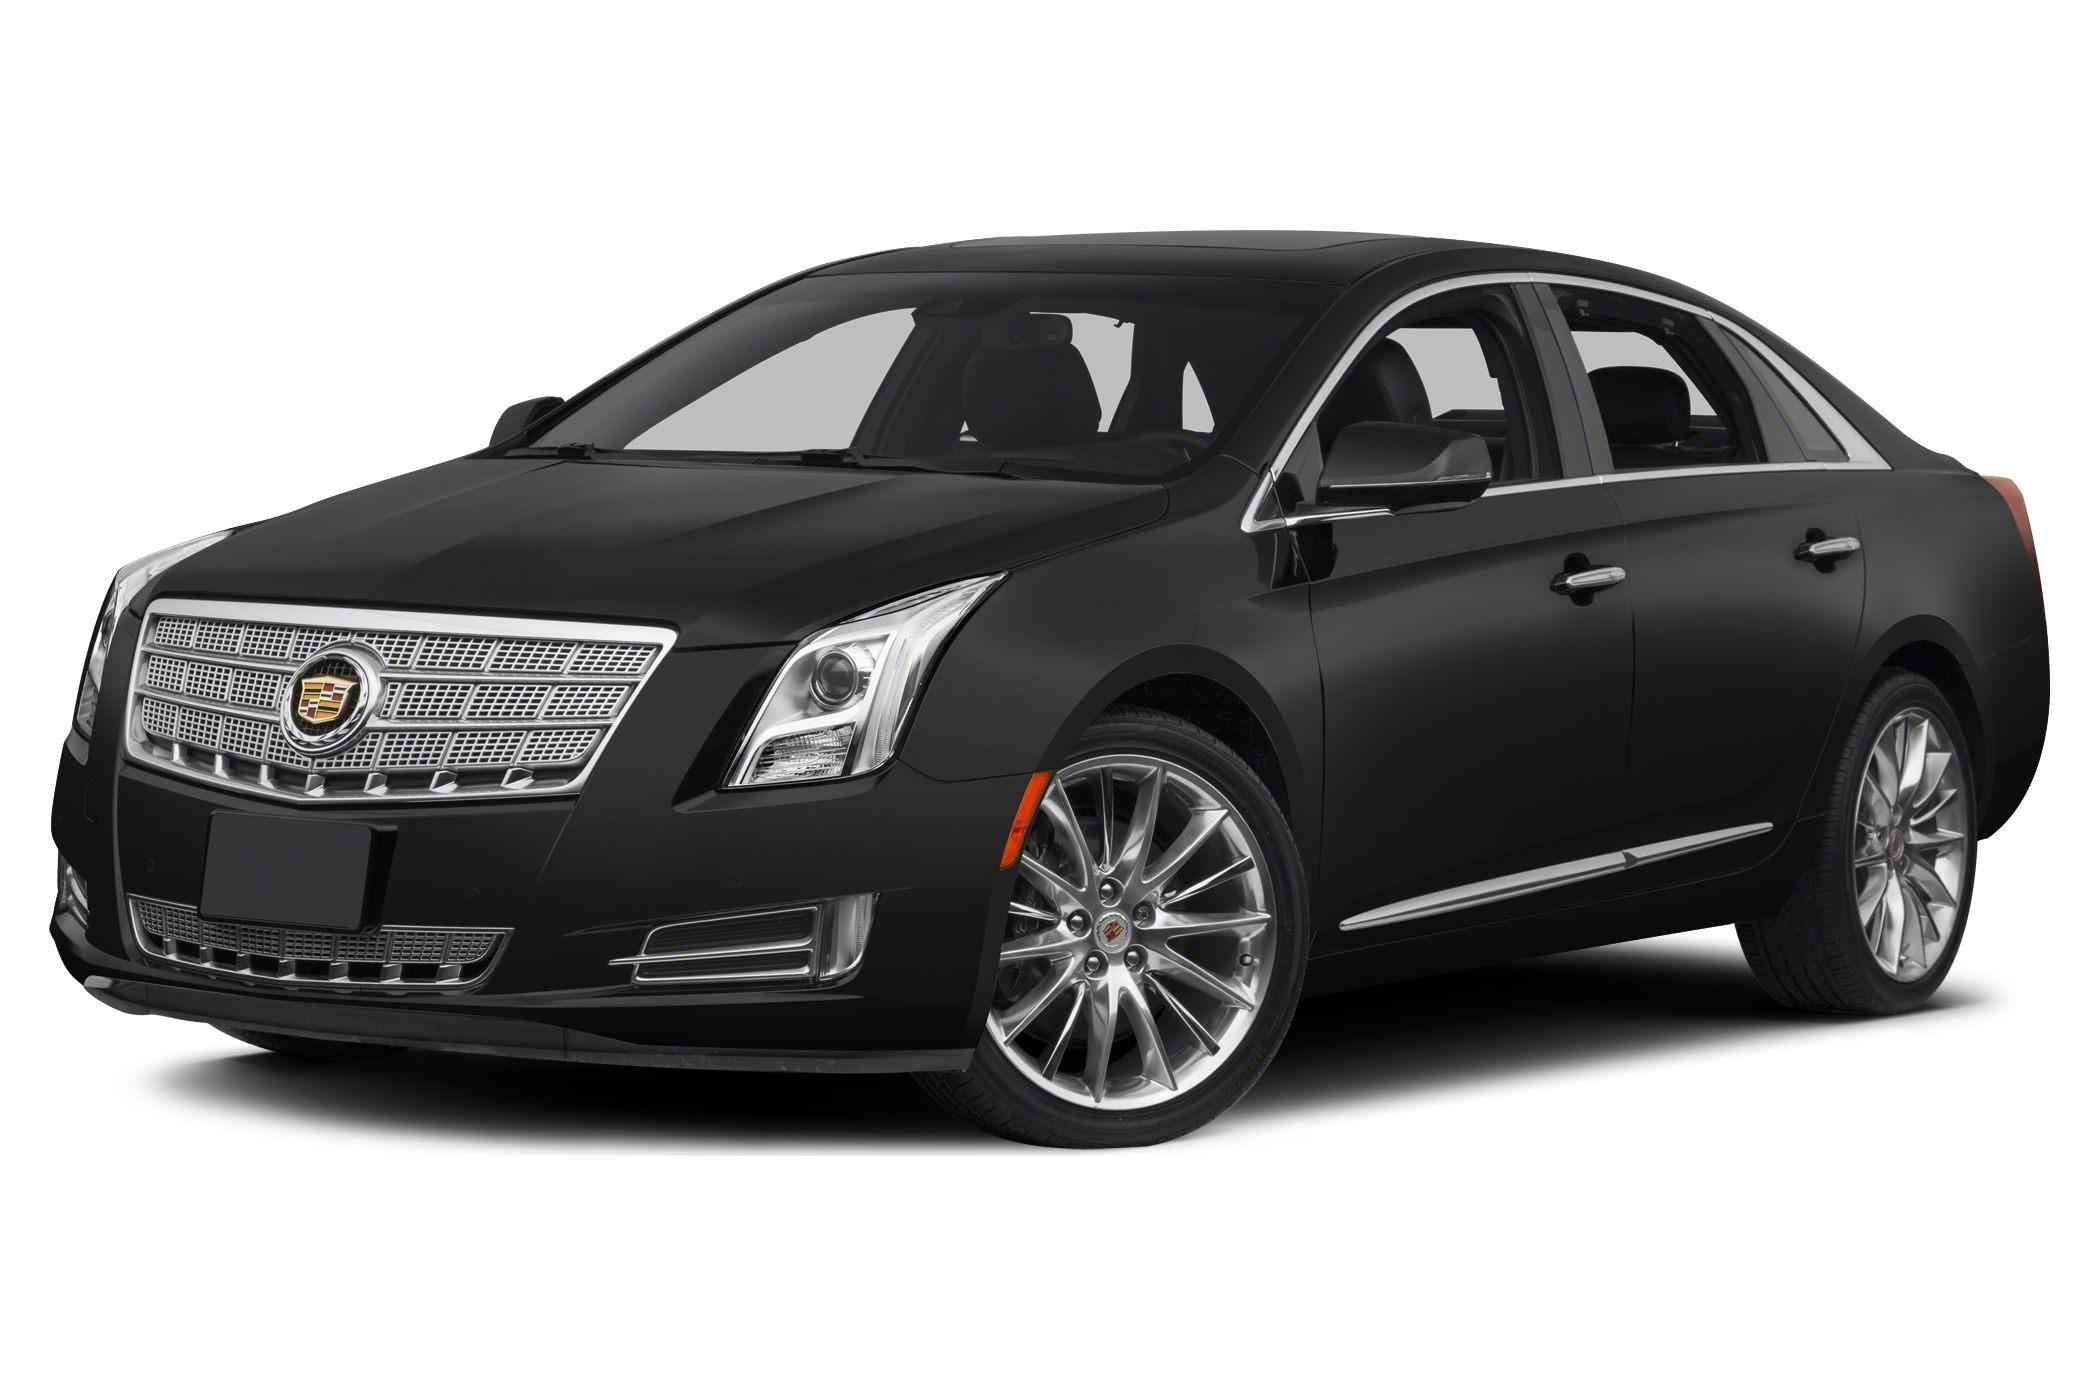 cadillac 2015 xts. 2015 cadillac xts vsport platinum twin turbo 4dr allwheel drive sedan specs and prices xts 1